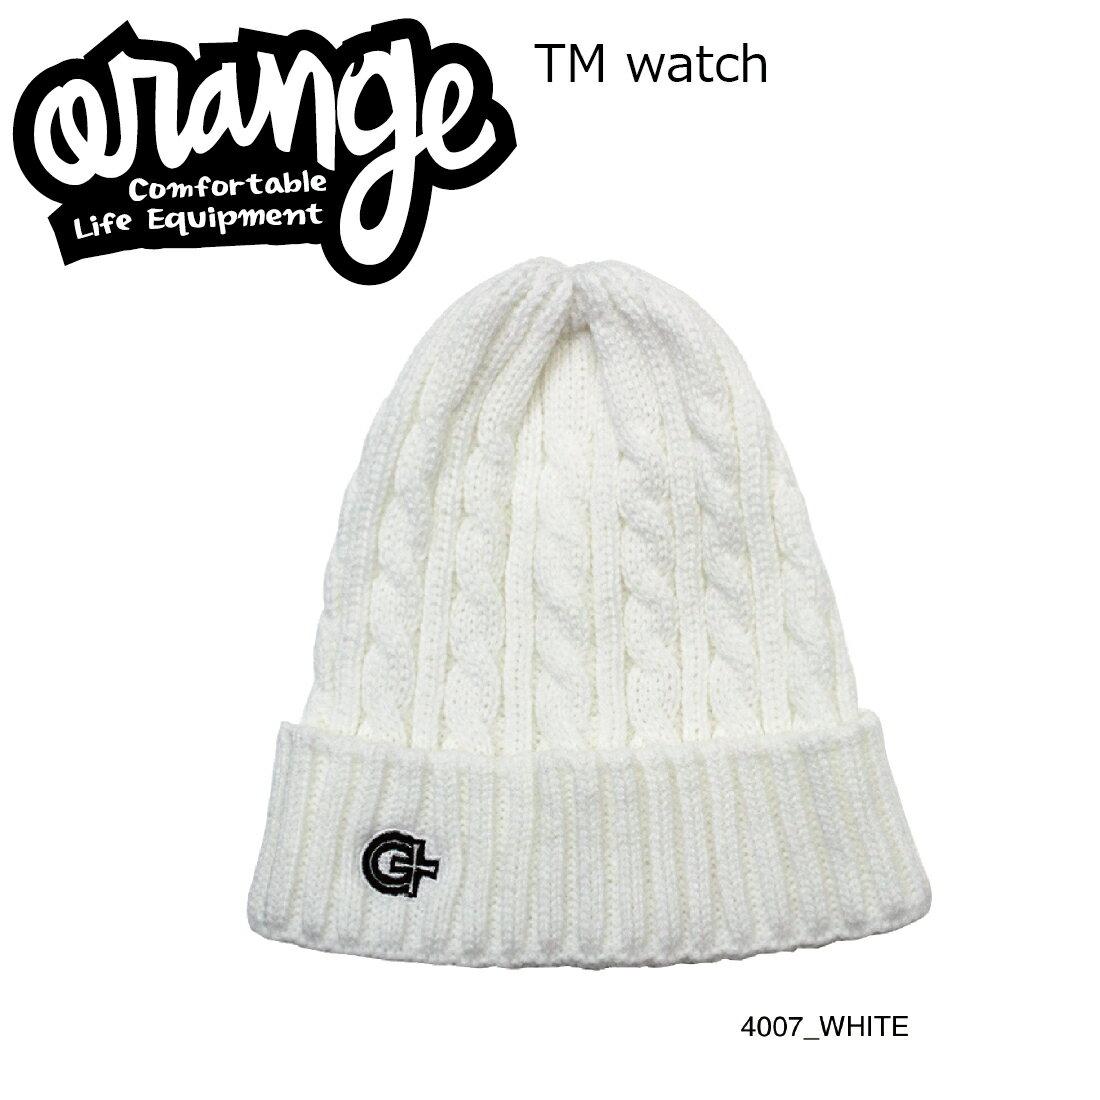 Oran'ge Tm Watch Cap Beanie 4007 WHITE オレンジ ティーエム ワッチ キャップ ビーニー ニットキャップ 2つ折り